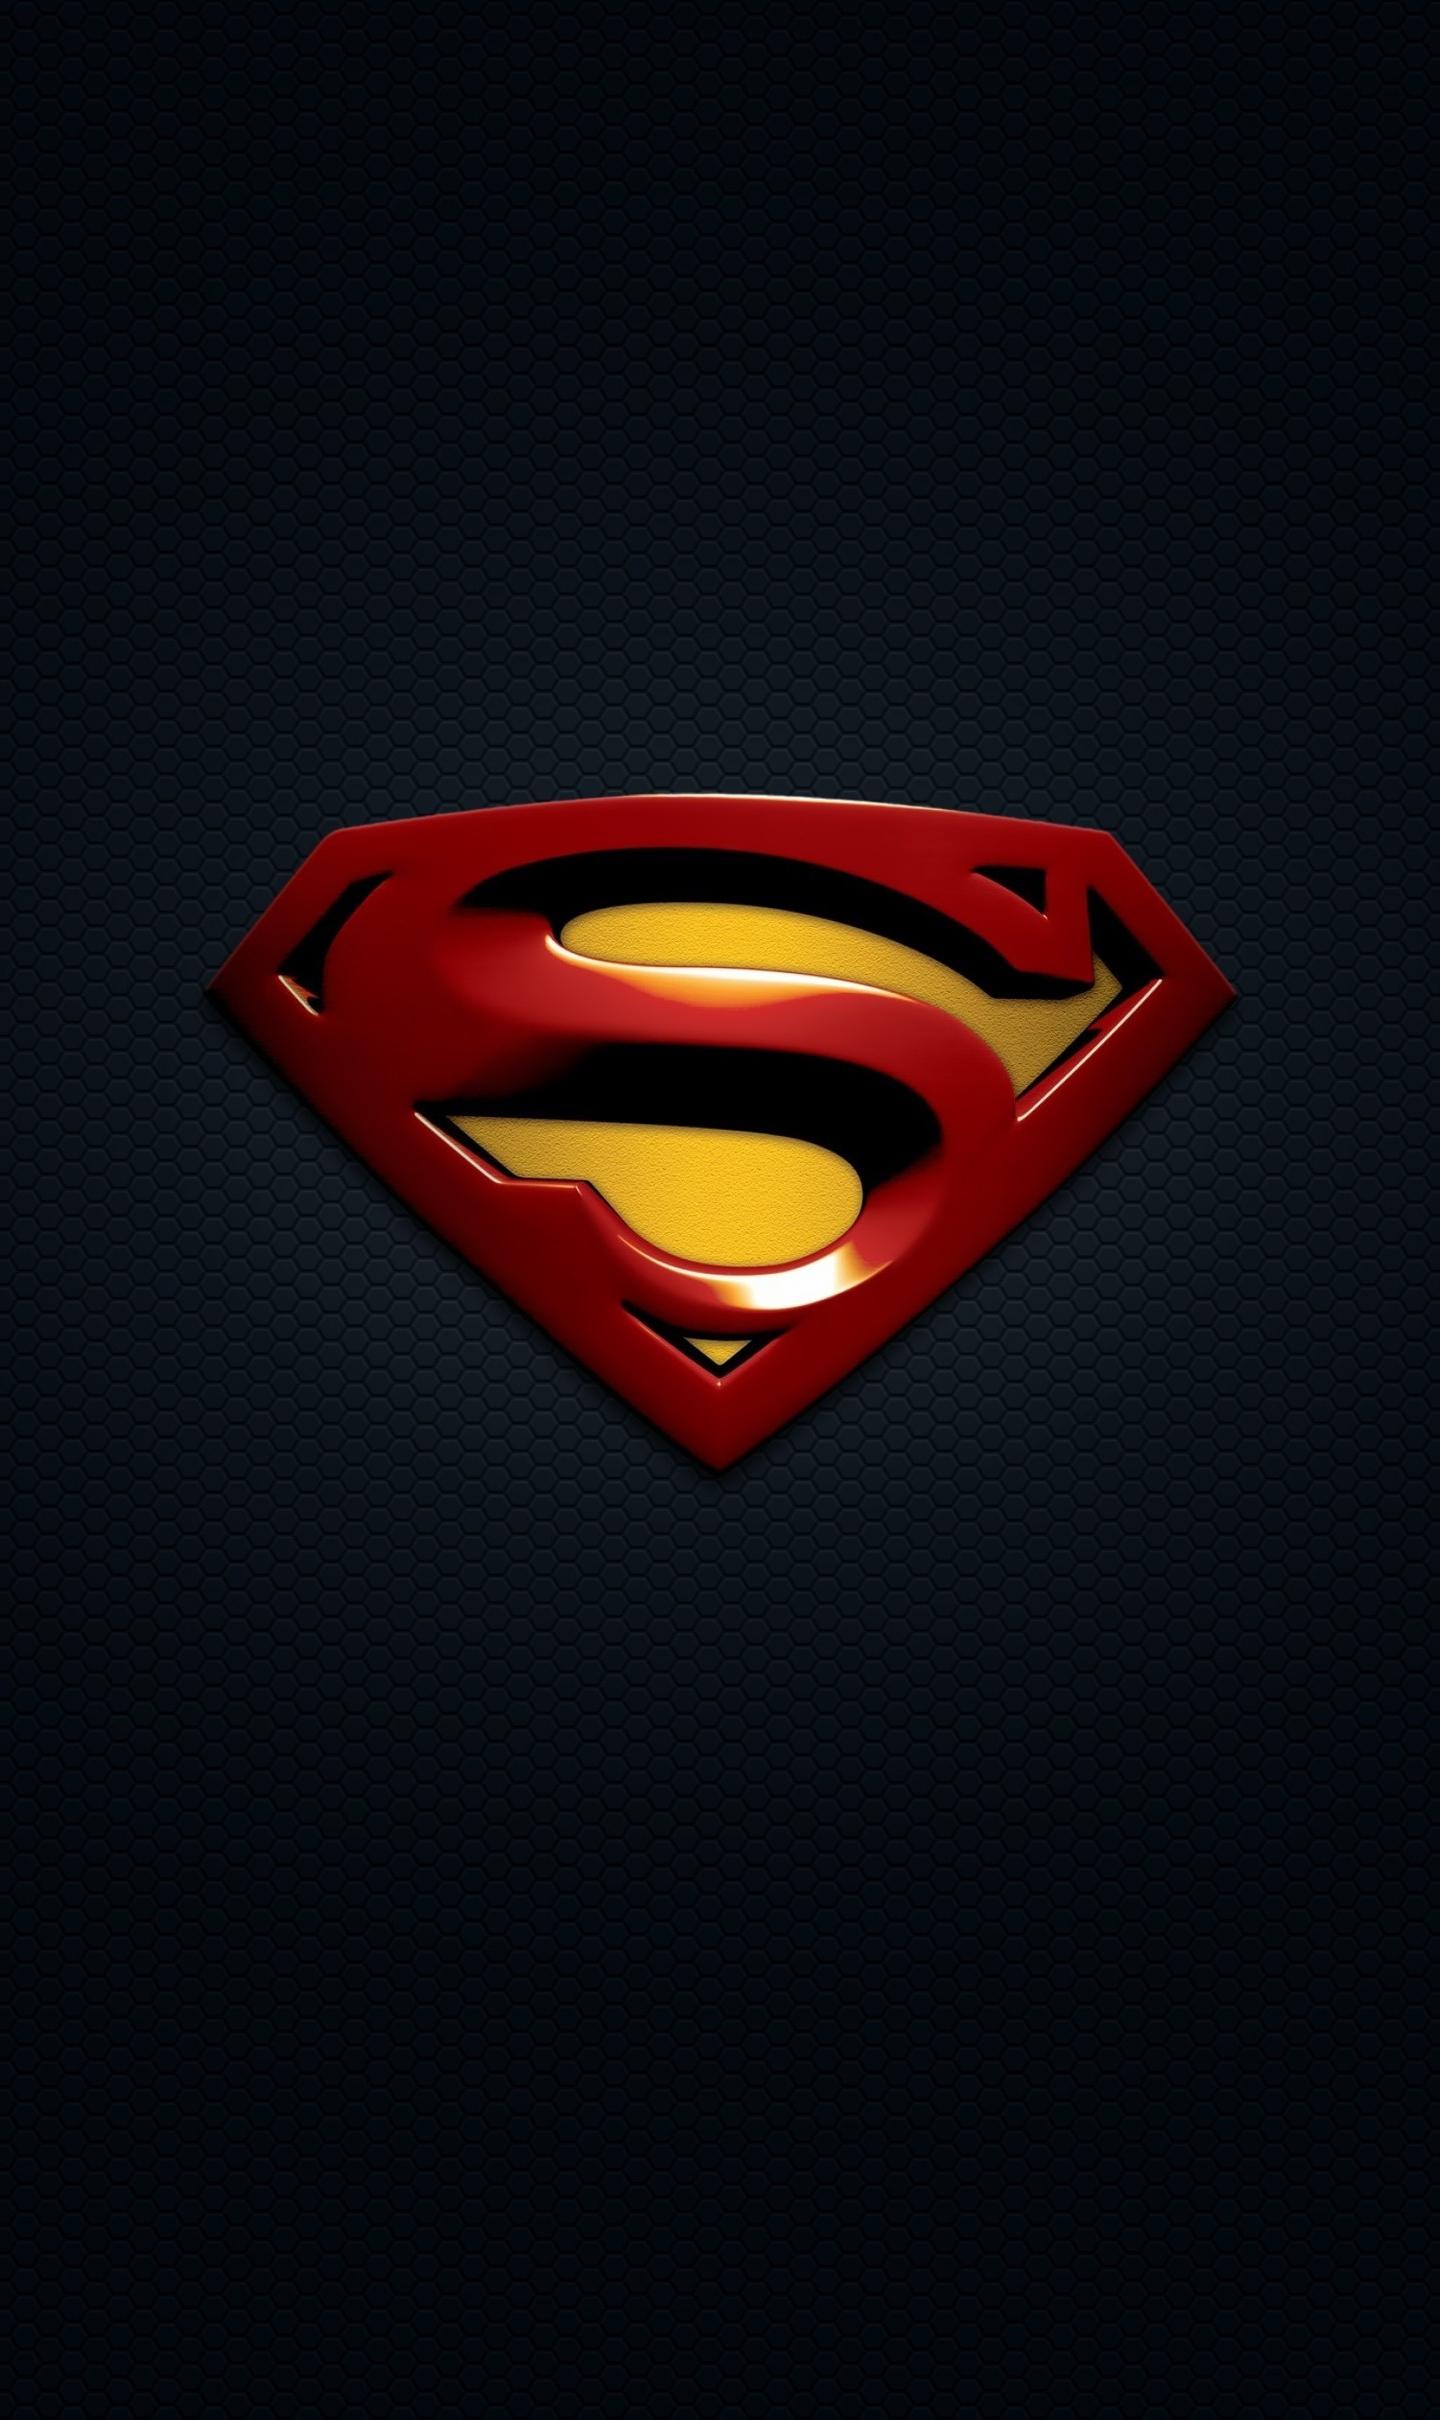 Download 1440x2960 Wallpaper Superman Logo Minimal Samsung Galaxy S8 Samsung Galaxy S8 Plus 1440x2960 Hd Image Background 4403